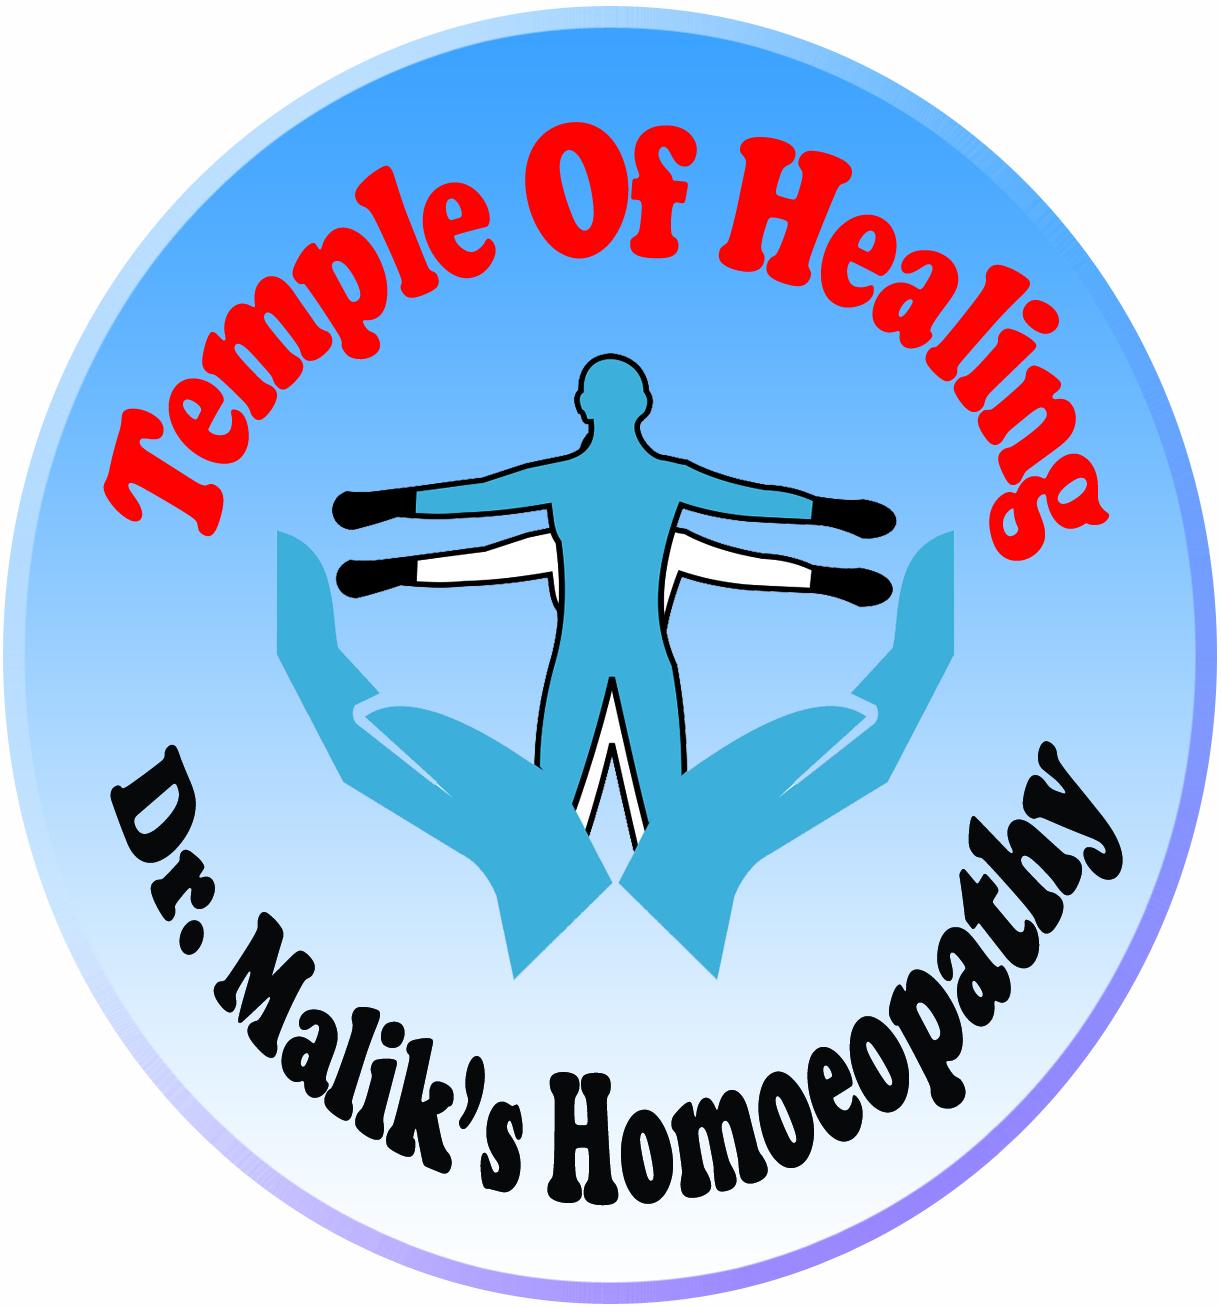 Temple Of Healing Homoeopathic Clinic, Gurgaon, Gurgaon